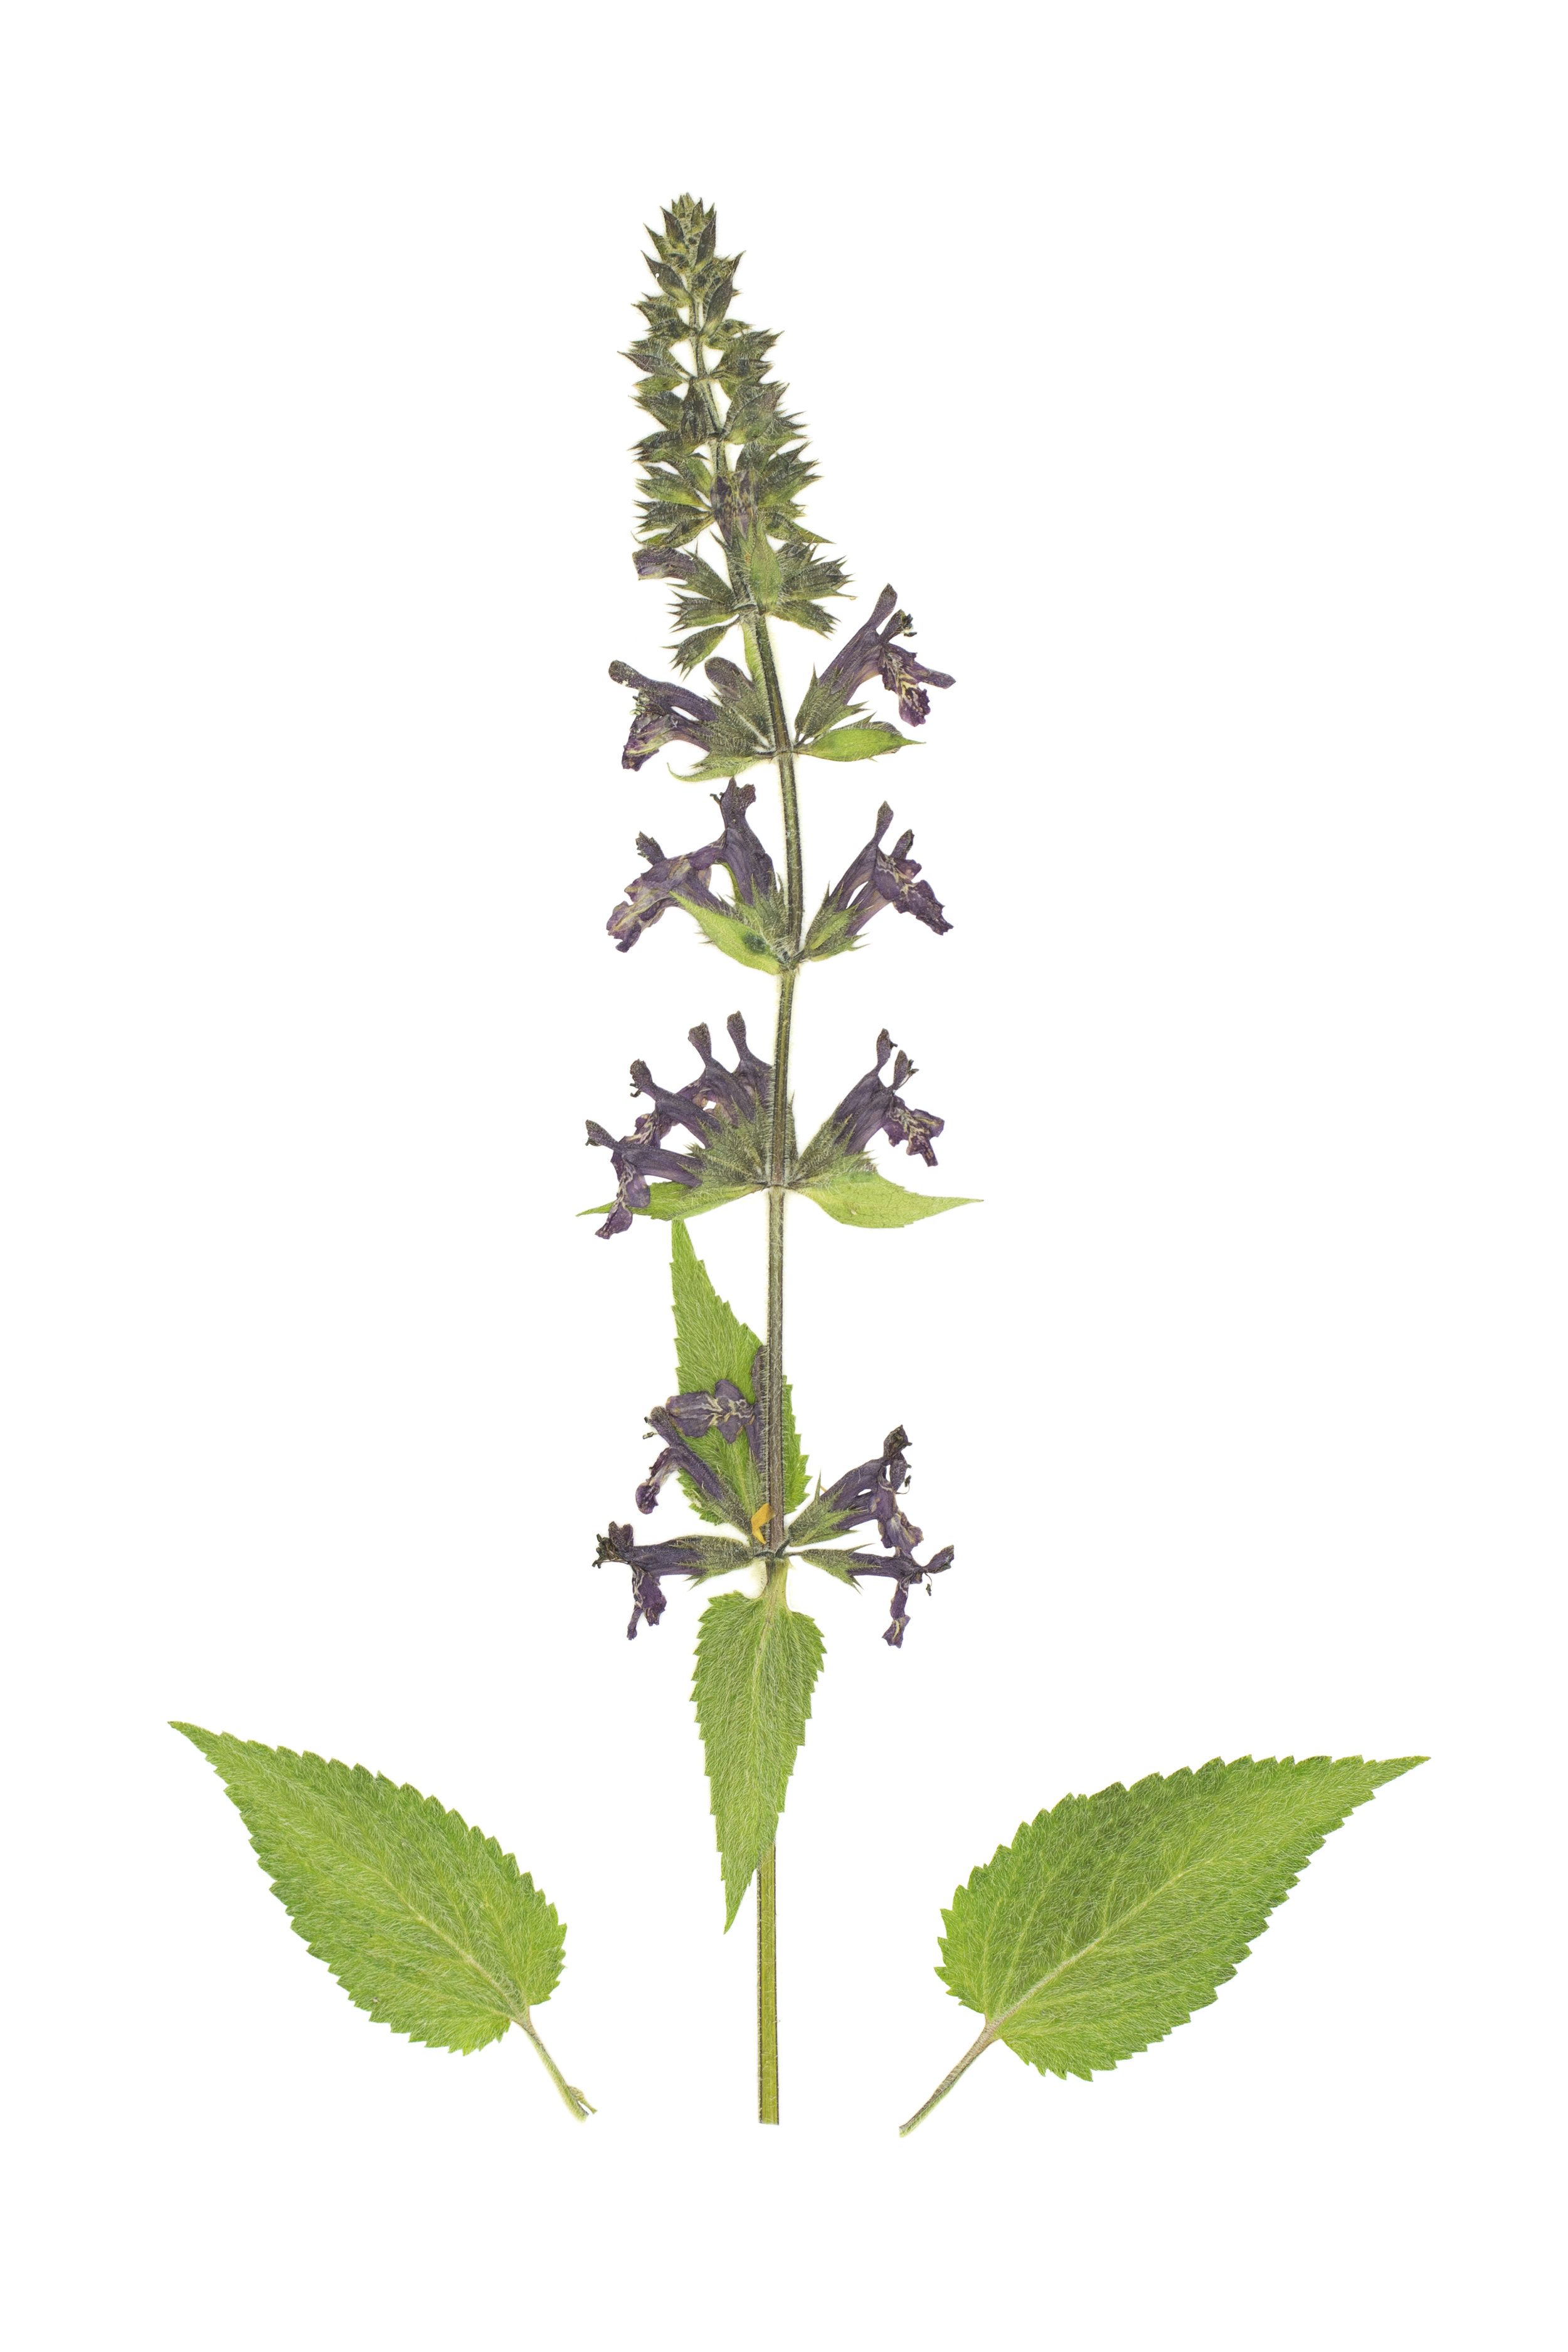 Hedge Woundwort / Stachys sylvatica